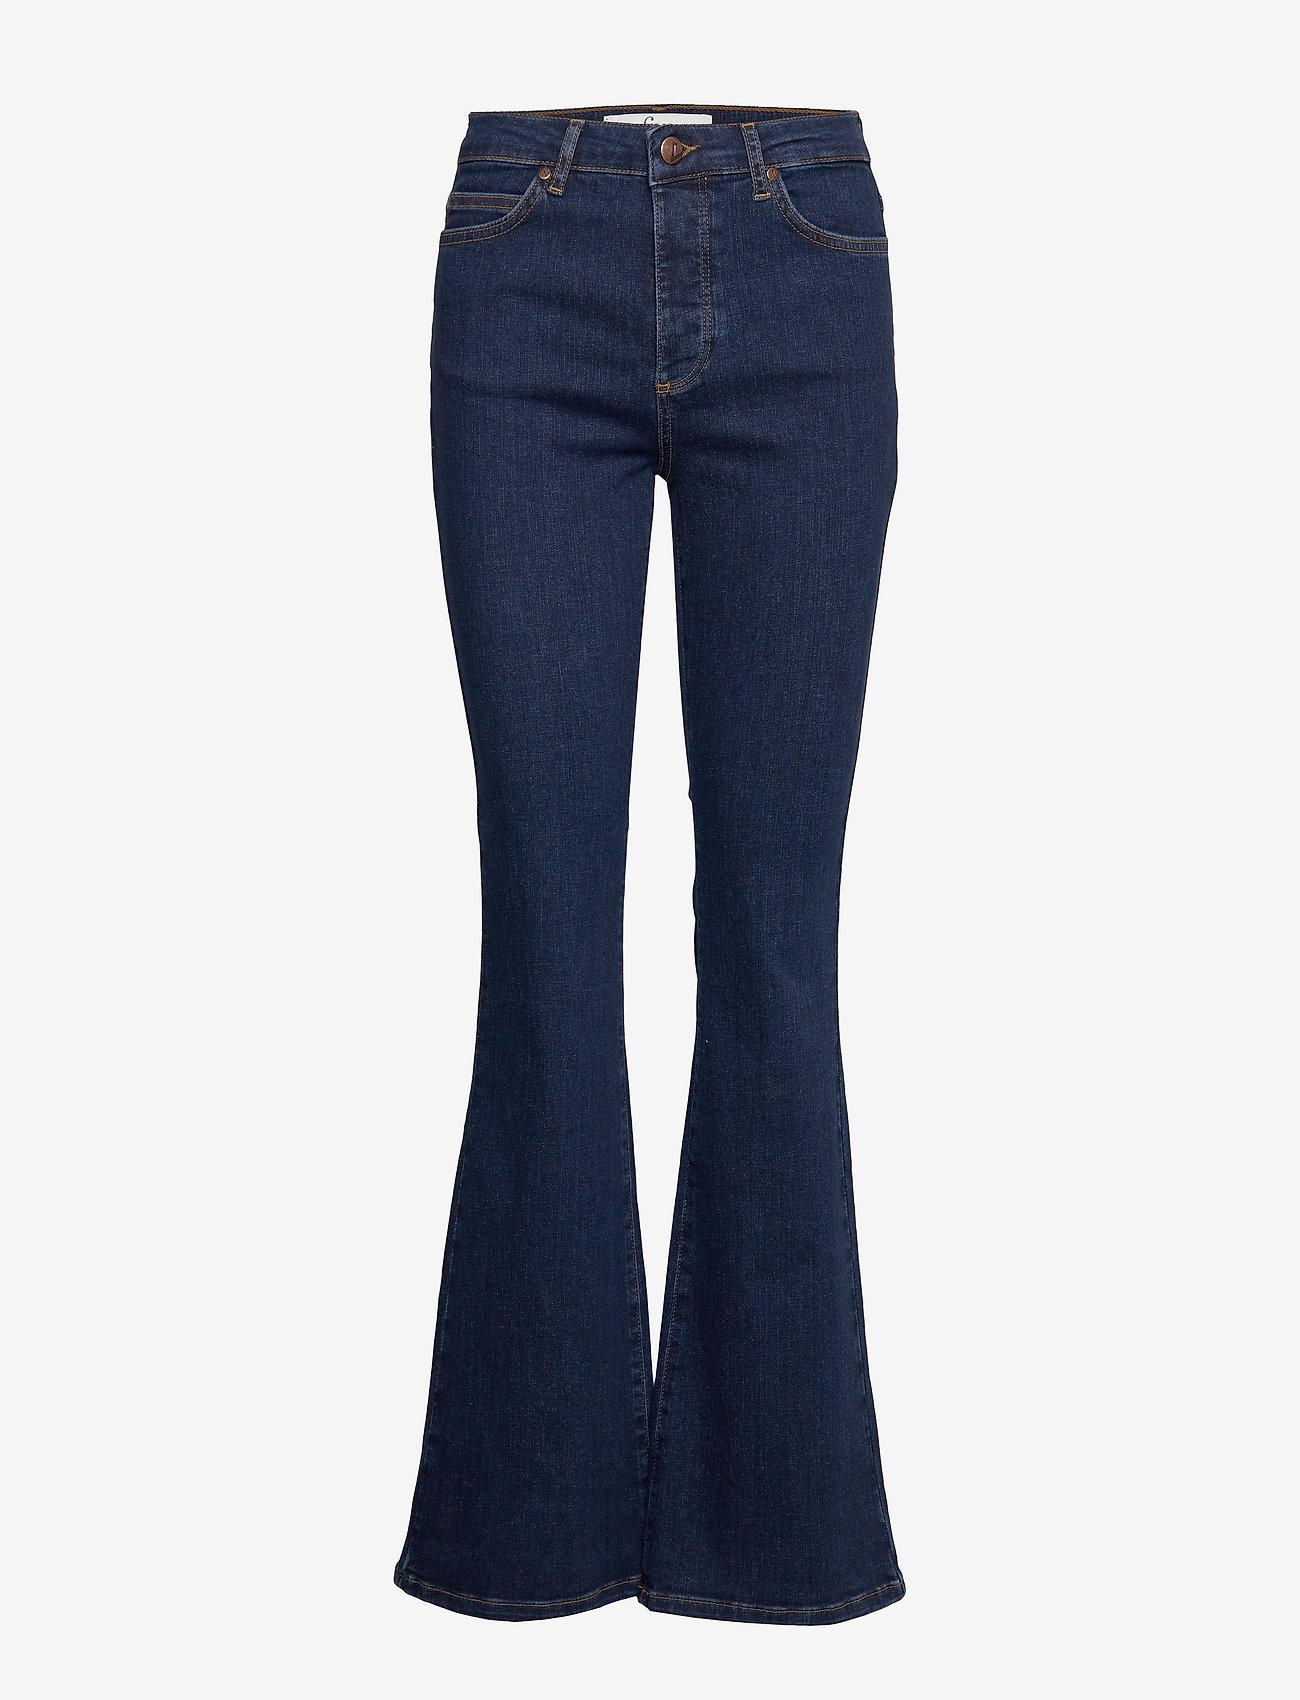 FIVEUNITS - Naomi 595 - utsvängda jeans - dark recycled - 0